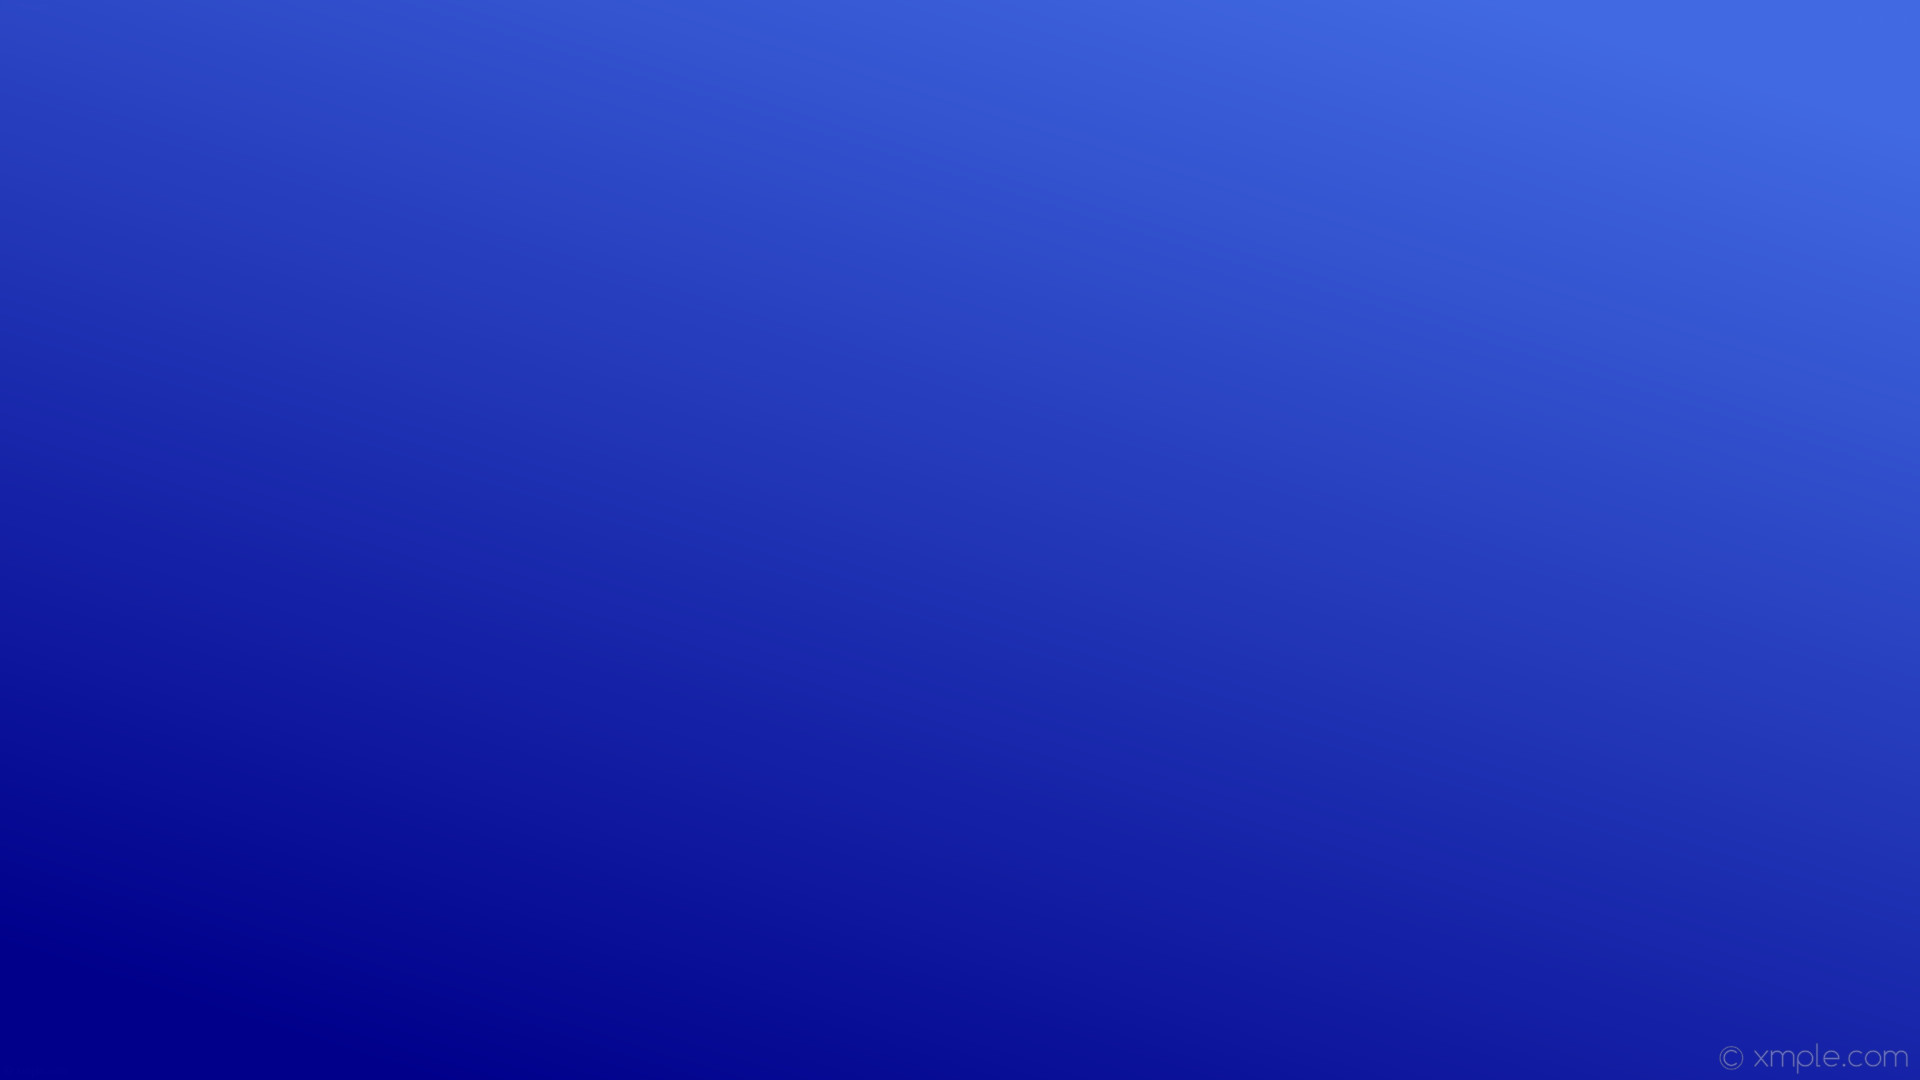 wallpaper blue gradient linear royal blue dark blue #4169e1 #00008b 45°